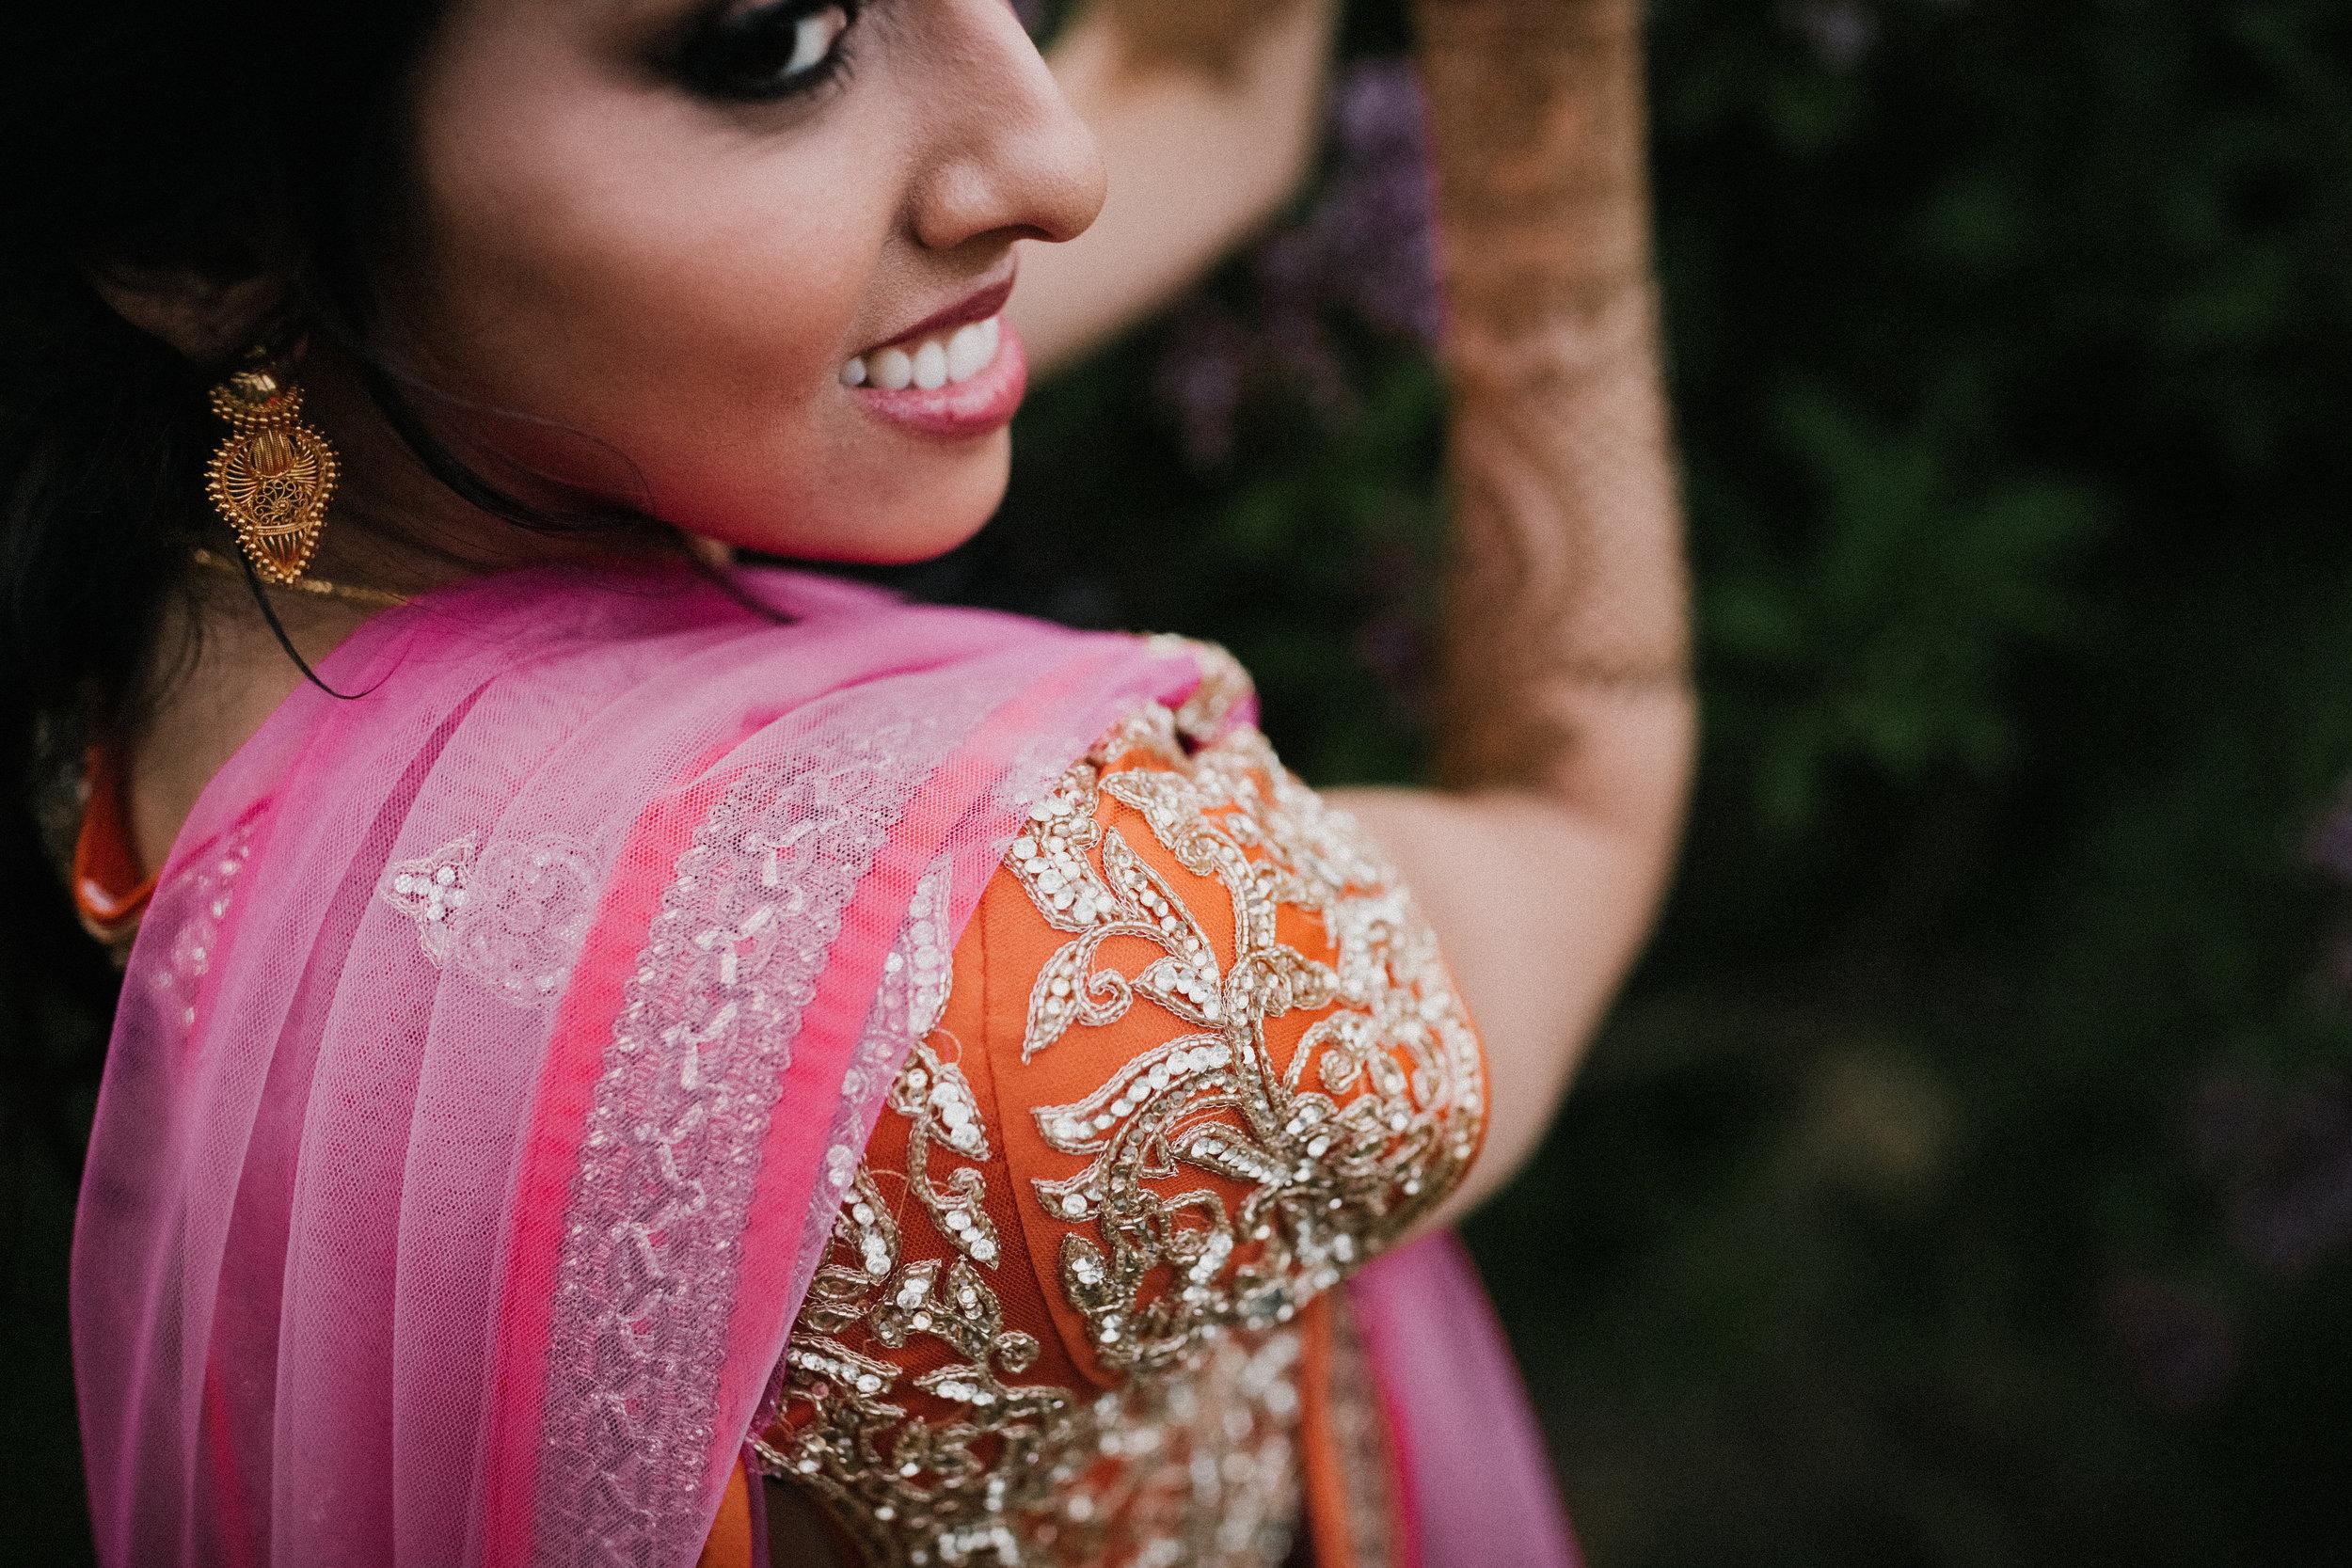 Aparna-Ankit-Patel-Mehndi-Wedding-Photos-0085.jpg